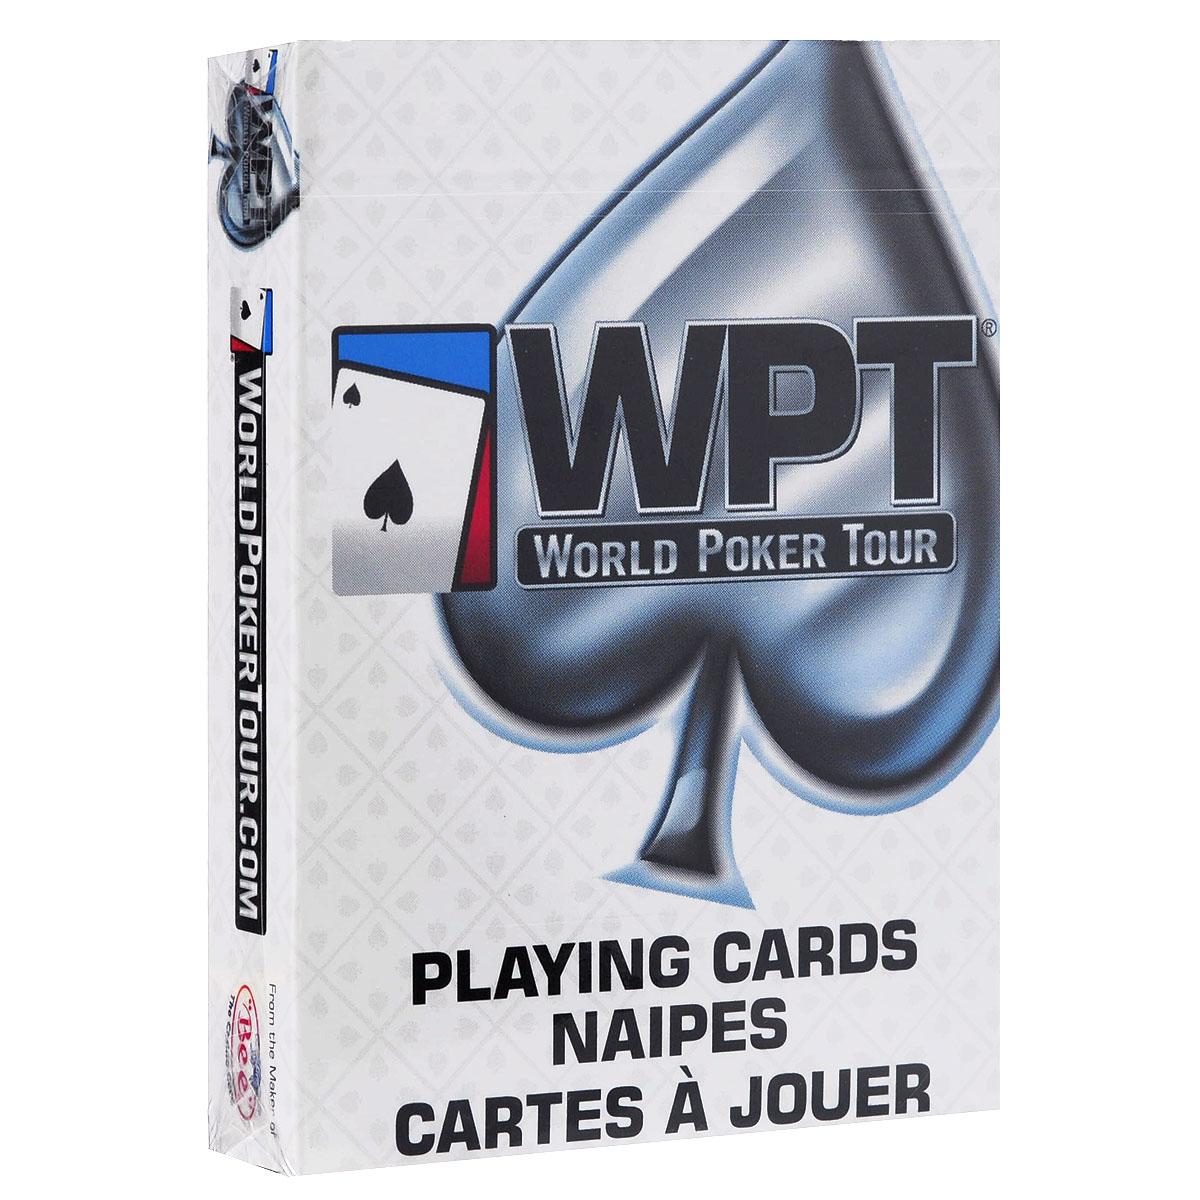 Карты игральные Bicycle World Poker Tour, цвет: белый, 54 карты. 9200б9200б